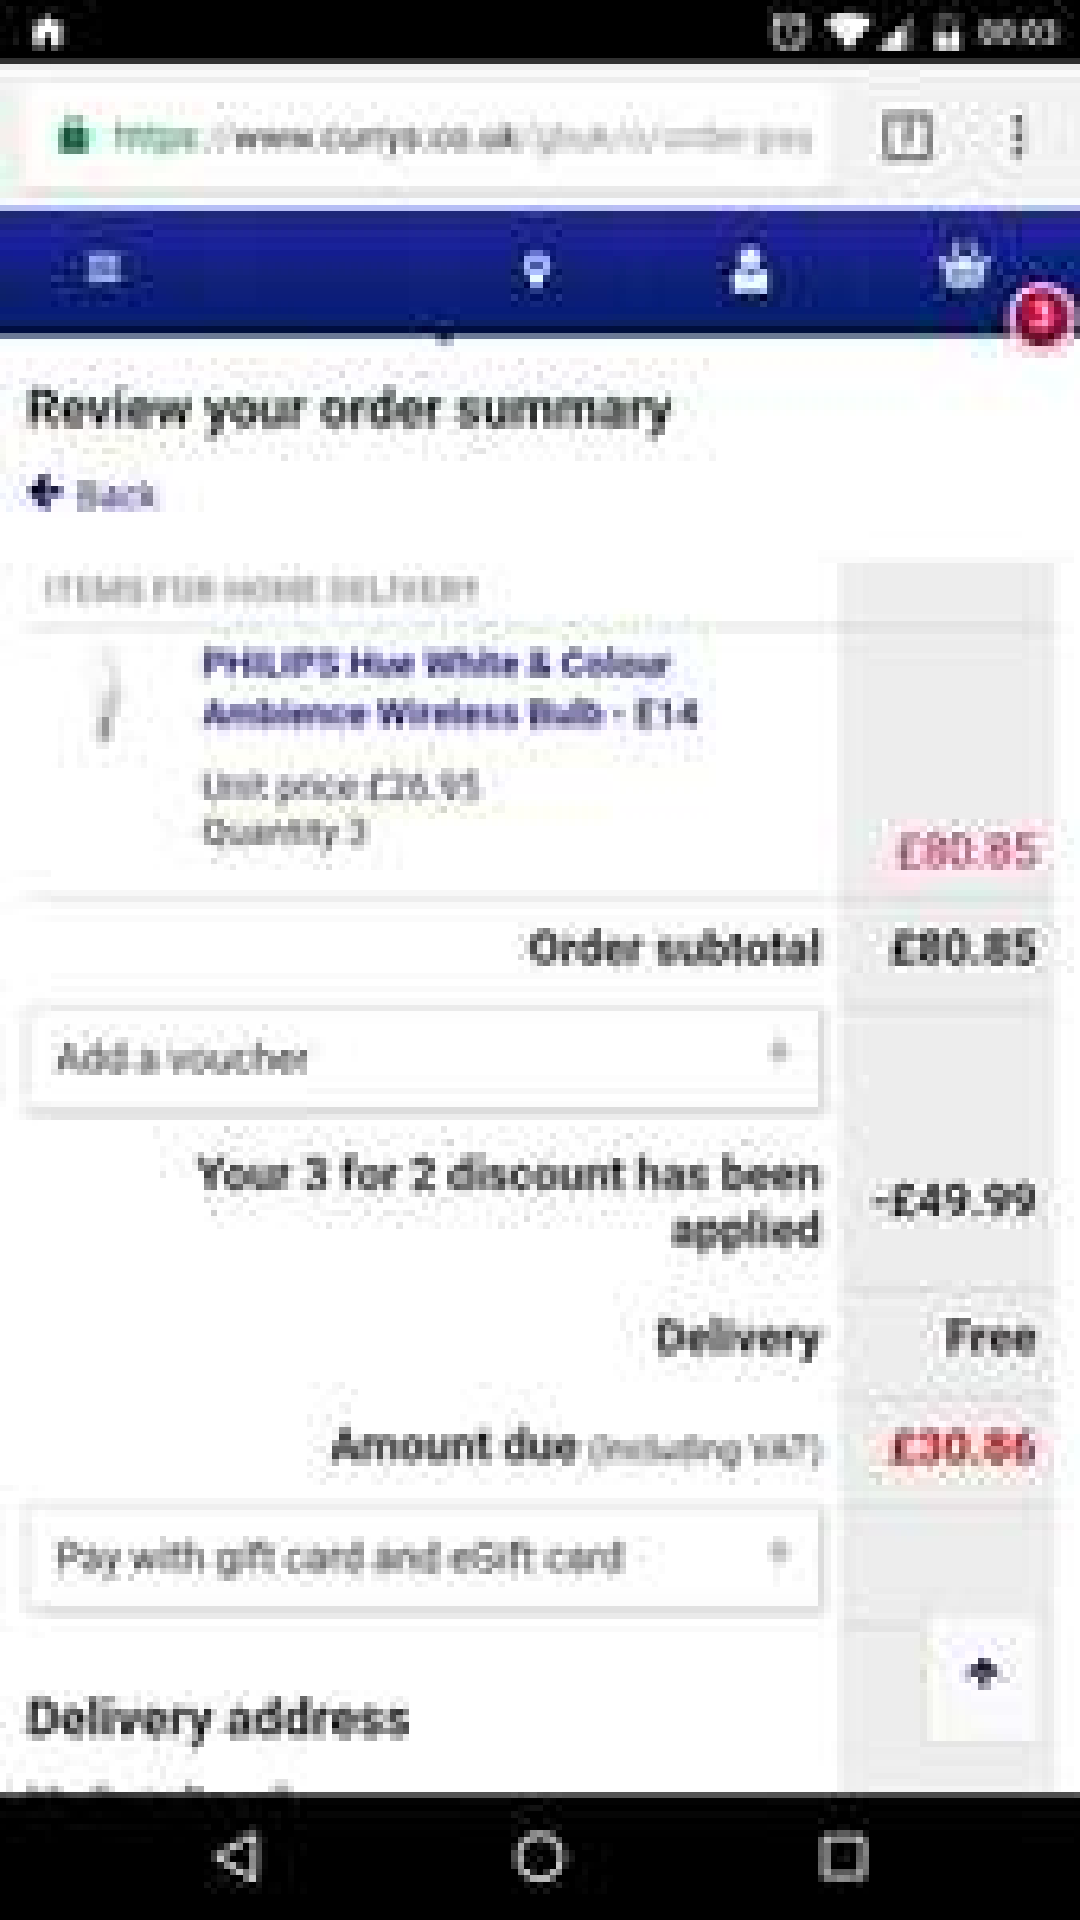 PHILIPS Hue 3x Hue e14 colour bulbs for £30.86 at Currys